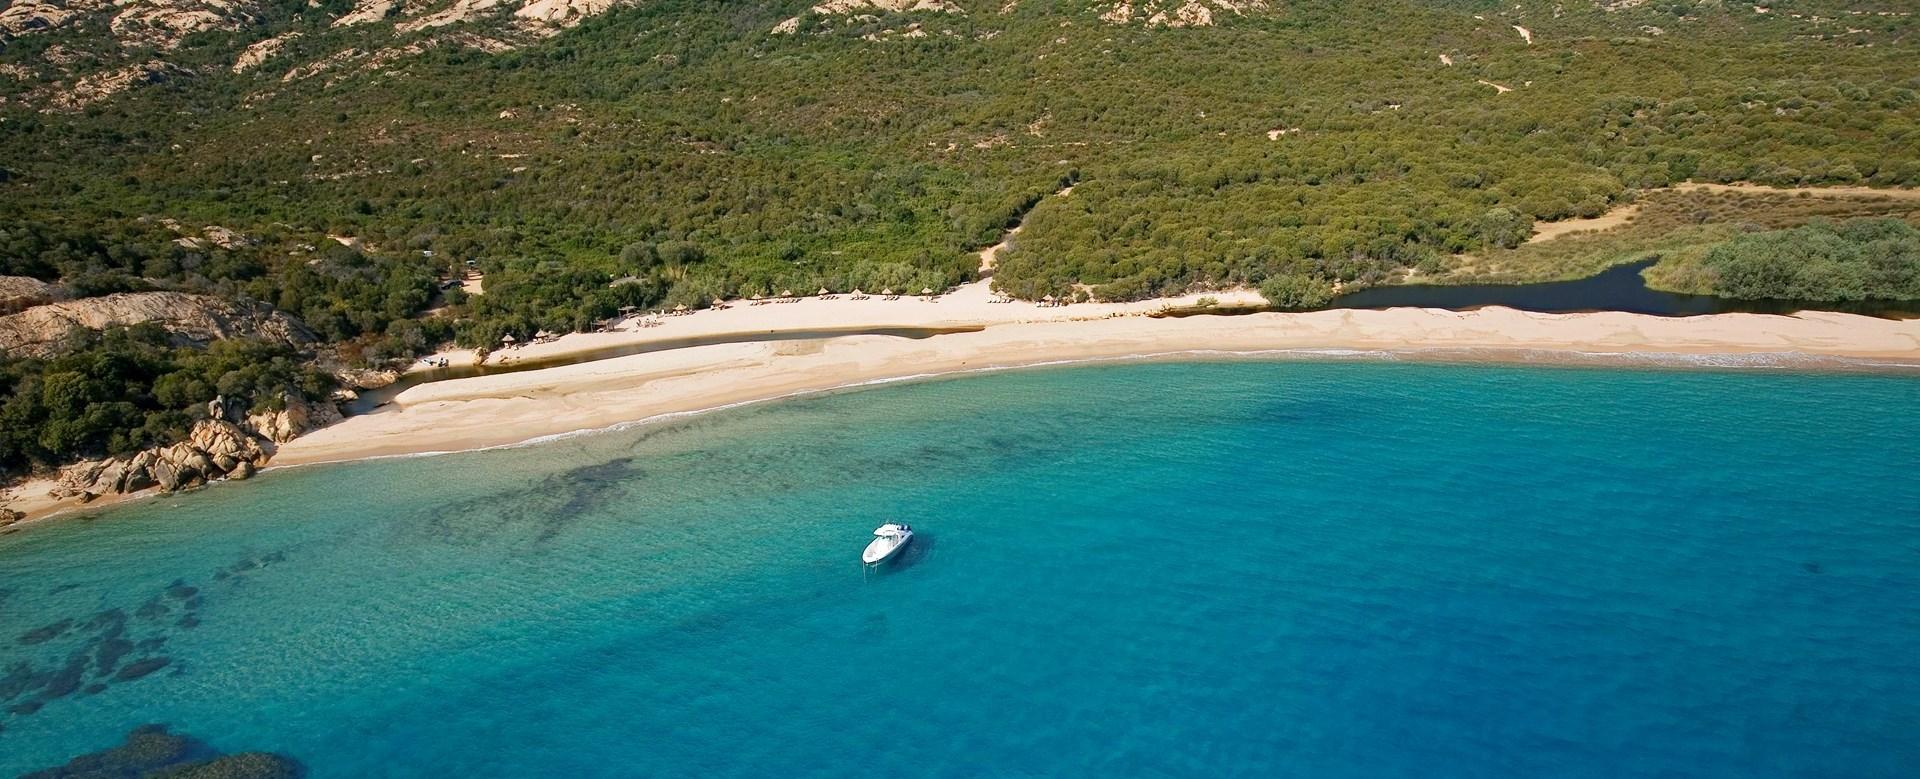 lerbaju-beach-corsica